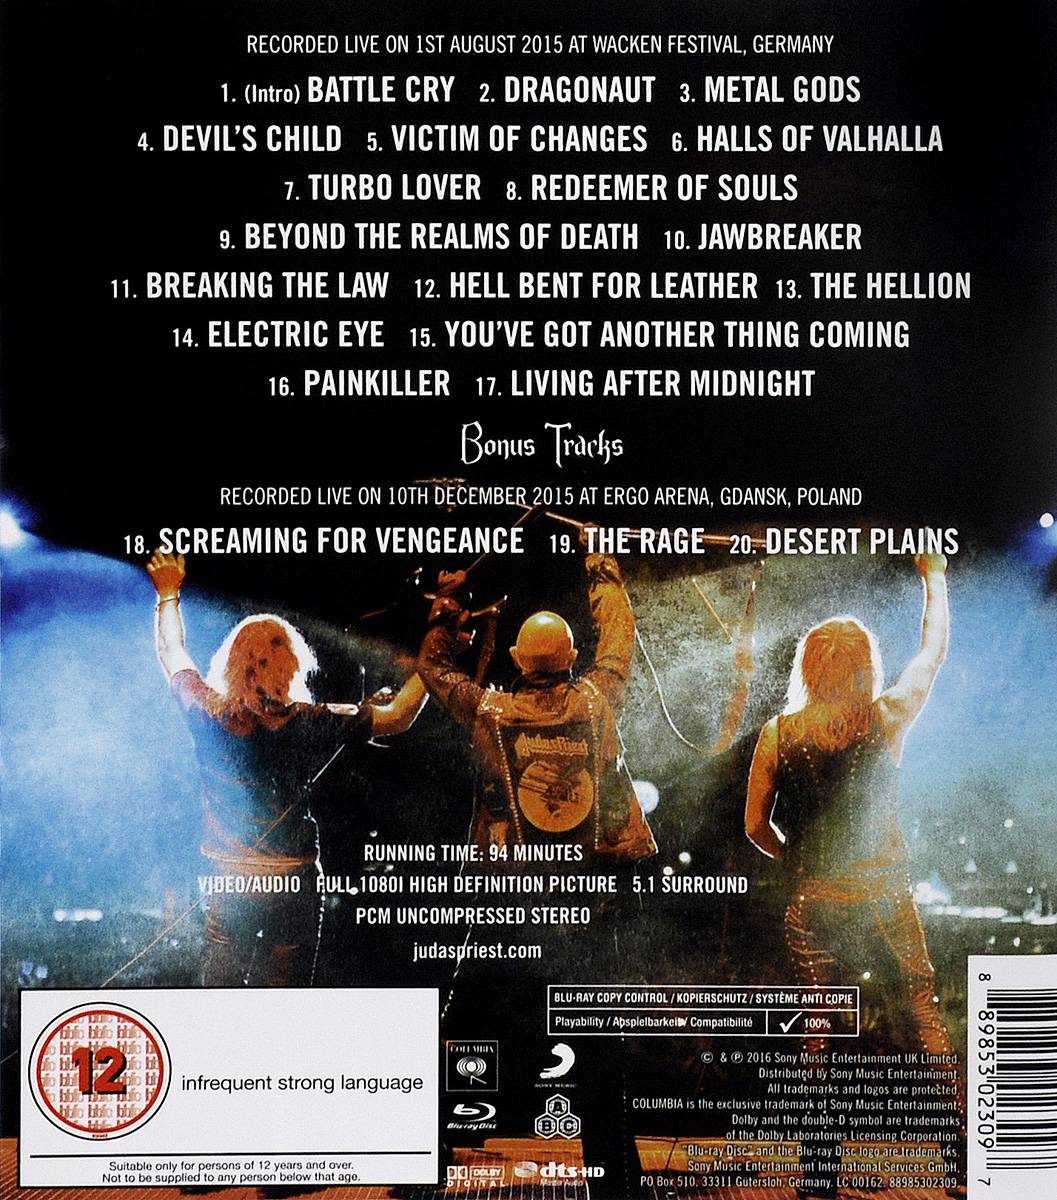 Judas Priest:  Battlecry (Blu-ray) Sony Music Entertainment, Inc.